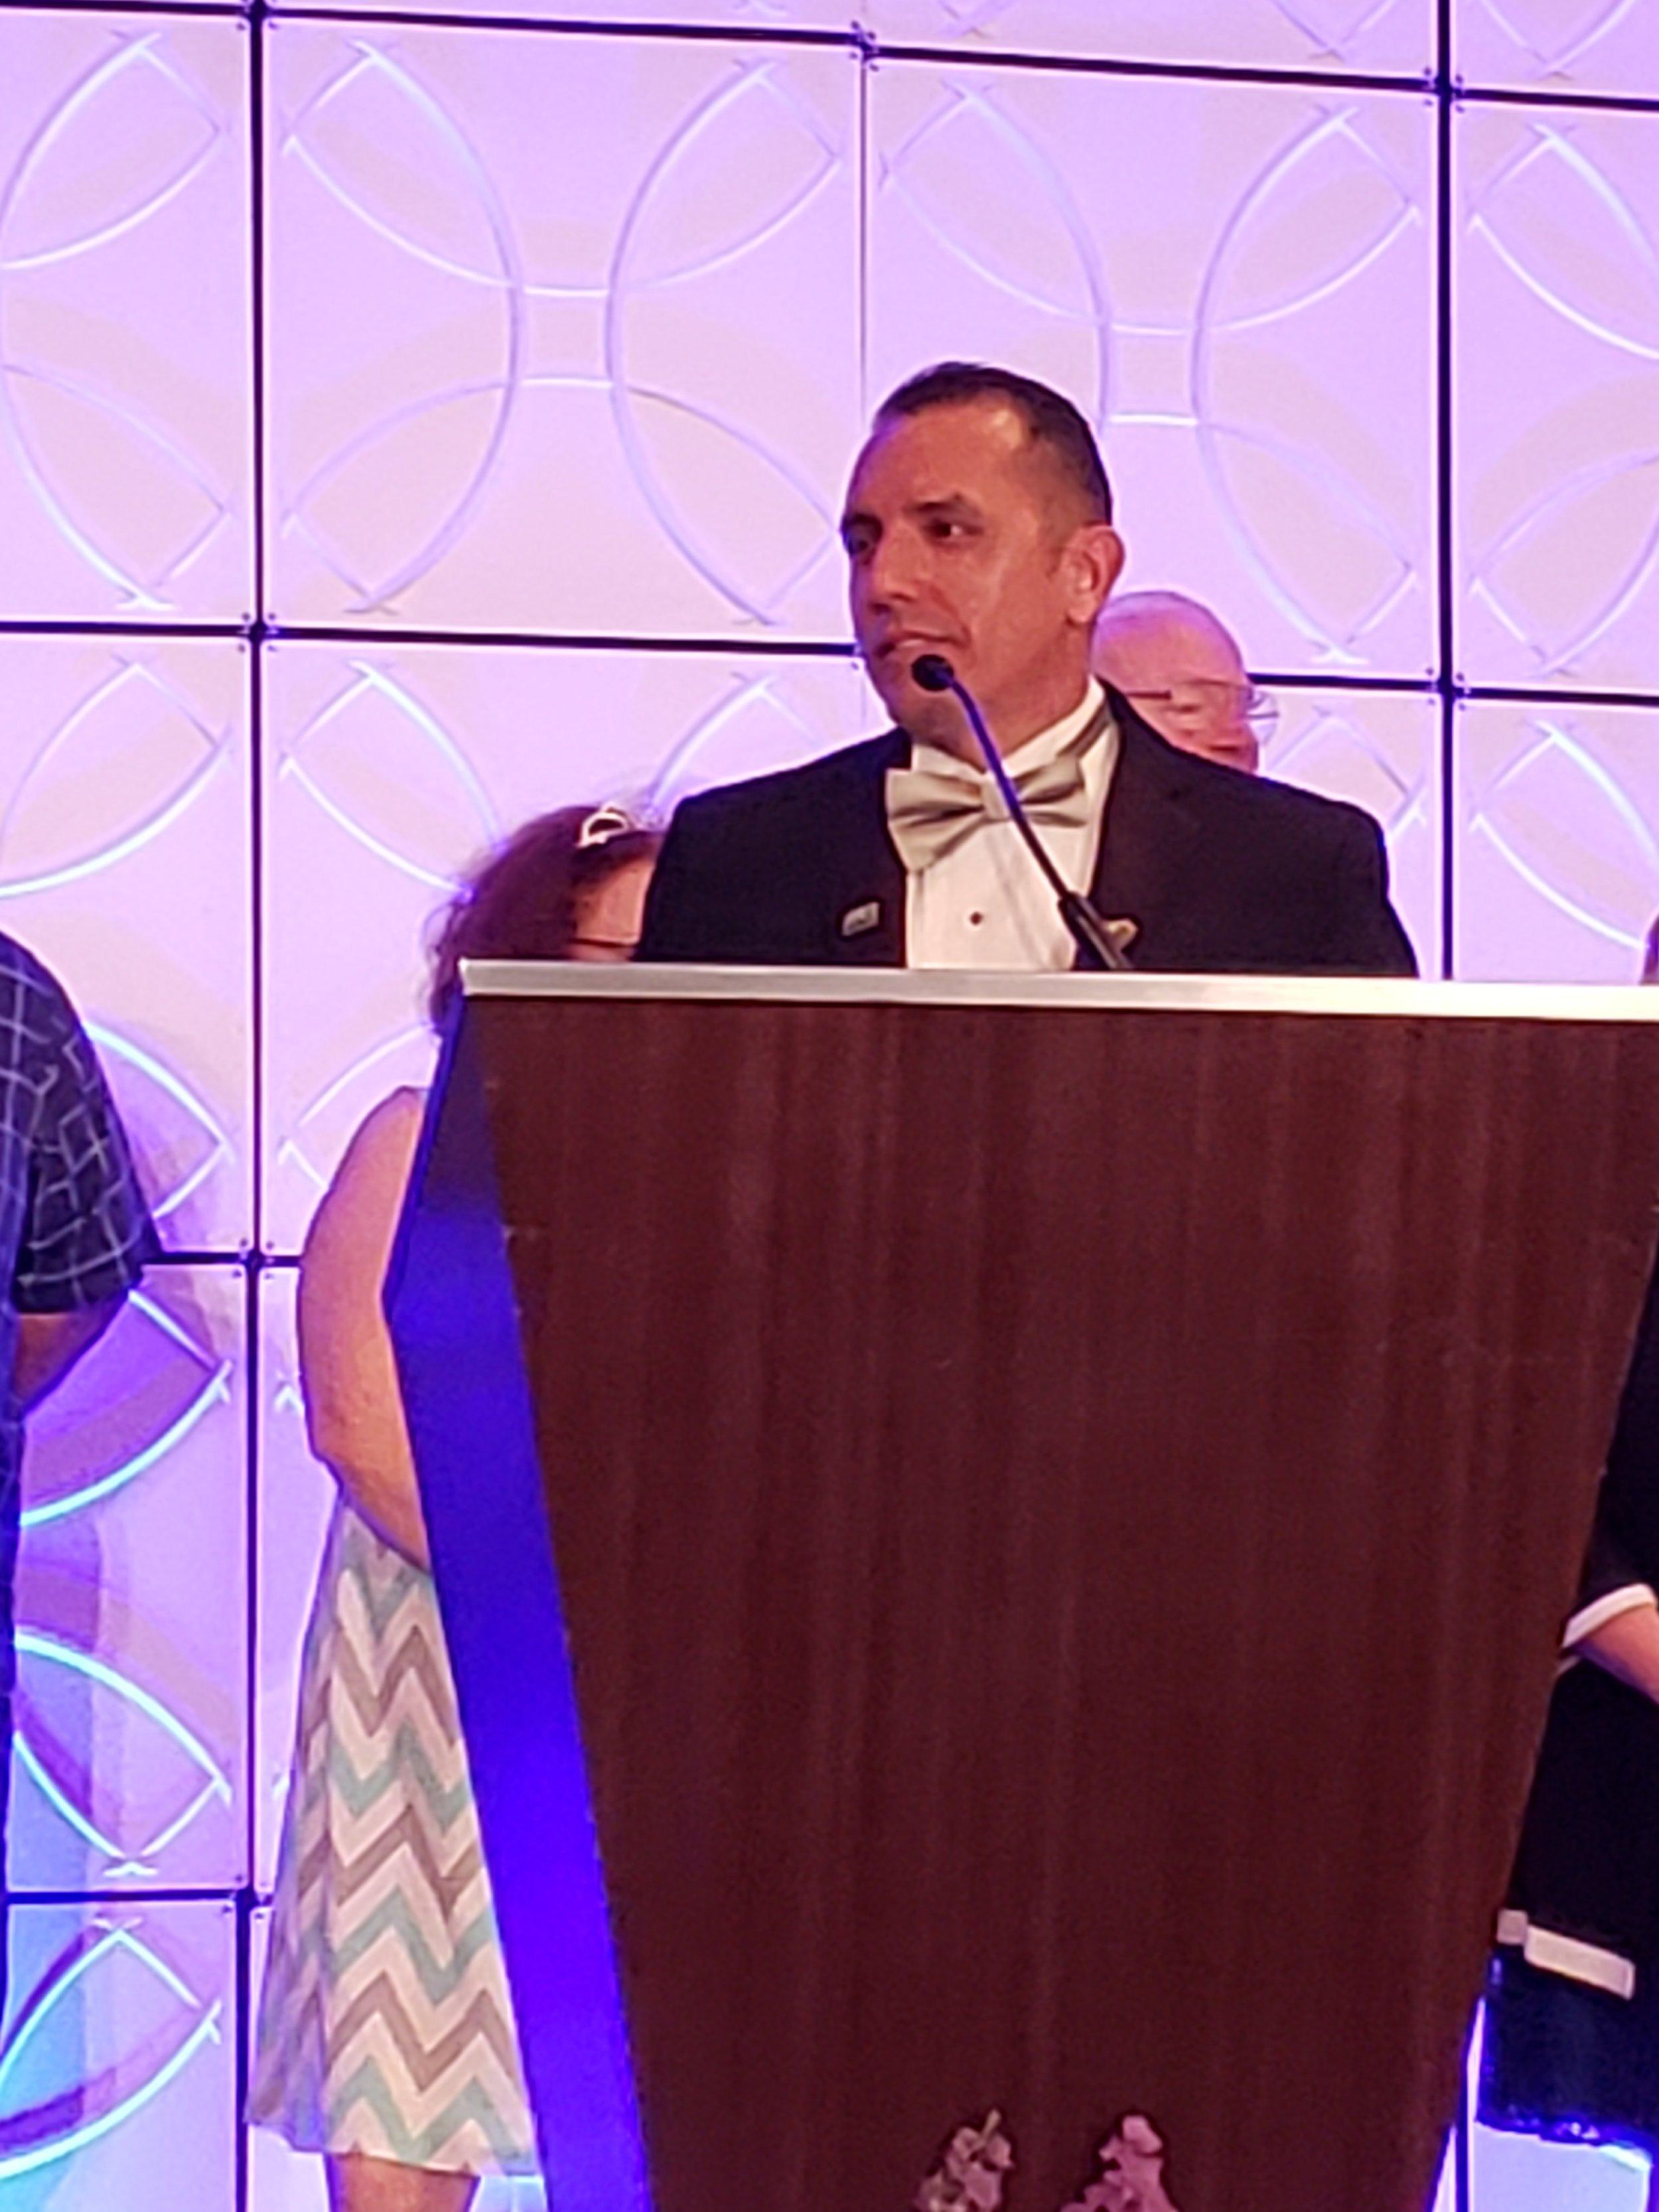 CCAE-State-Conference-San_Diego-2019-SC (6).jpg